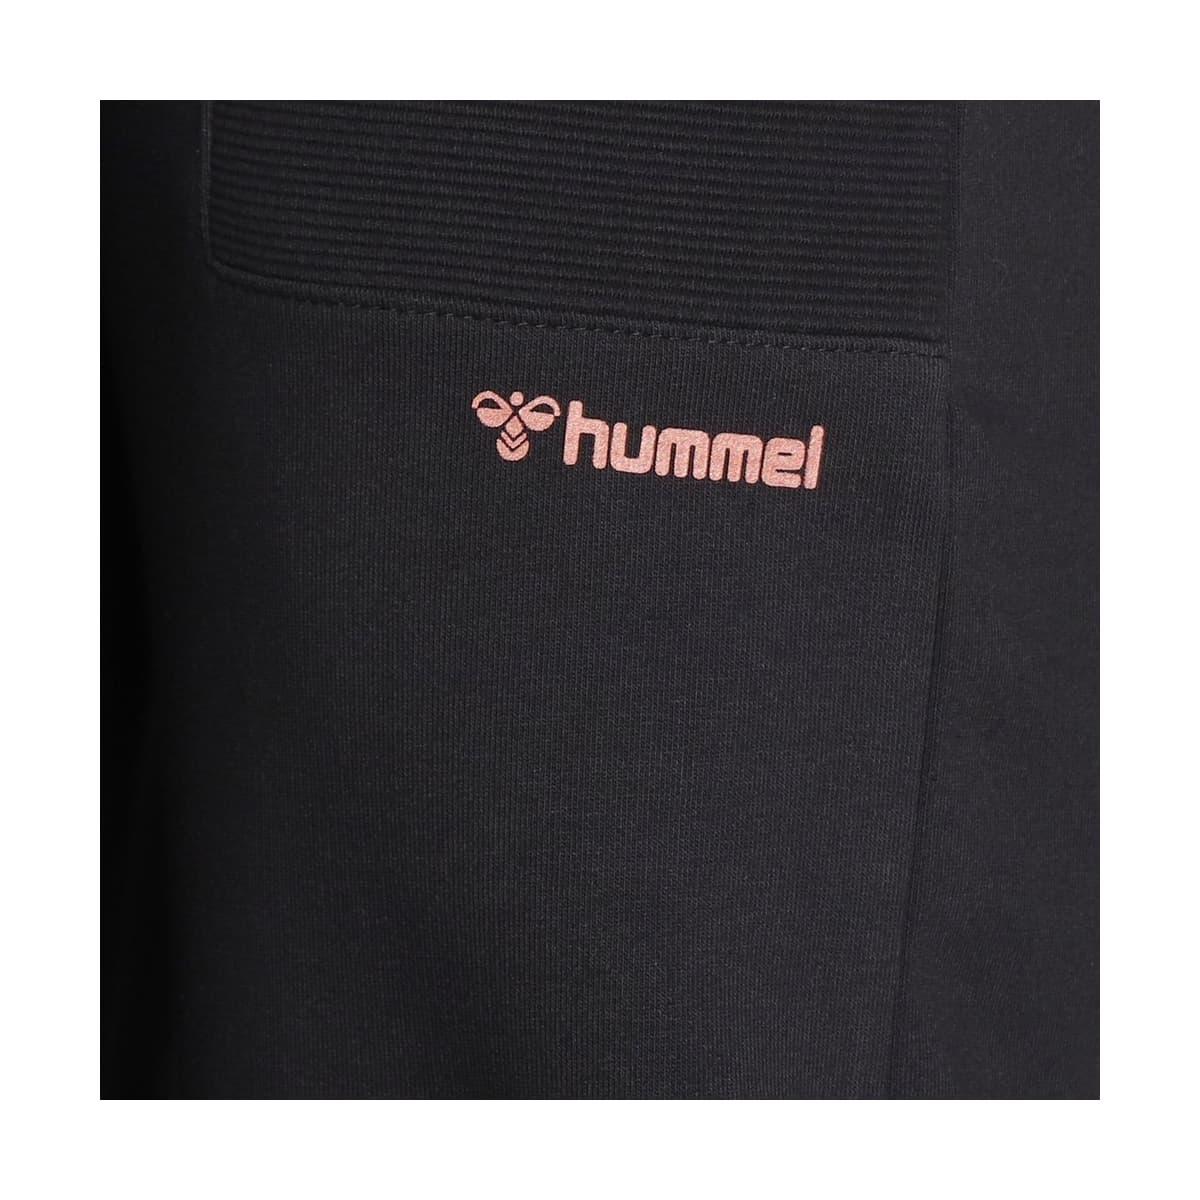 Hummel Dina Kadın Siyah Eşofman Altı (931260-2001)